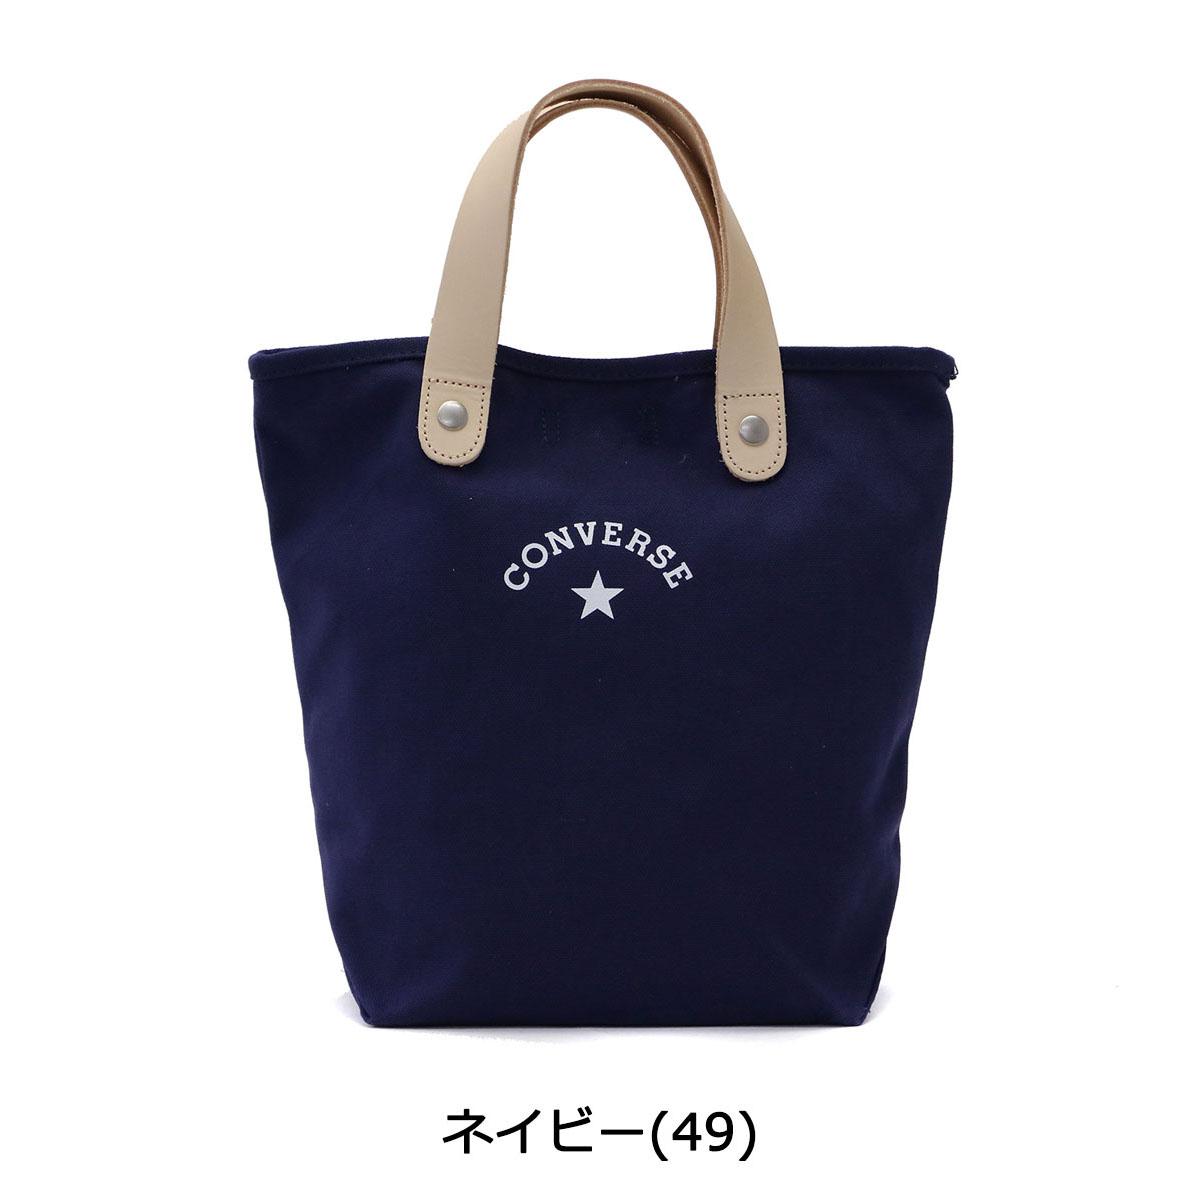 Converse Tote Bag CONVERSE CANVAS LEATHER TOTE BAG Tote Bag Women s Small  14478400 ccb43eb4d8ae7